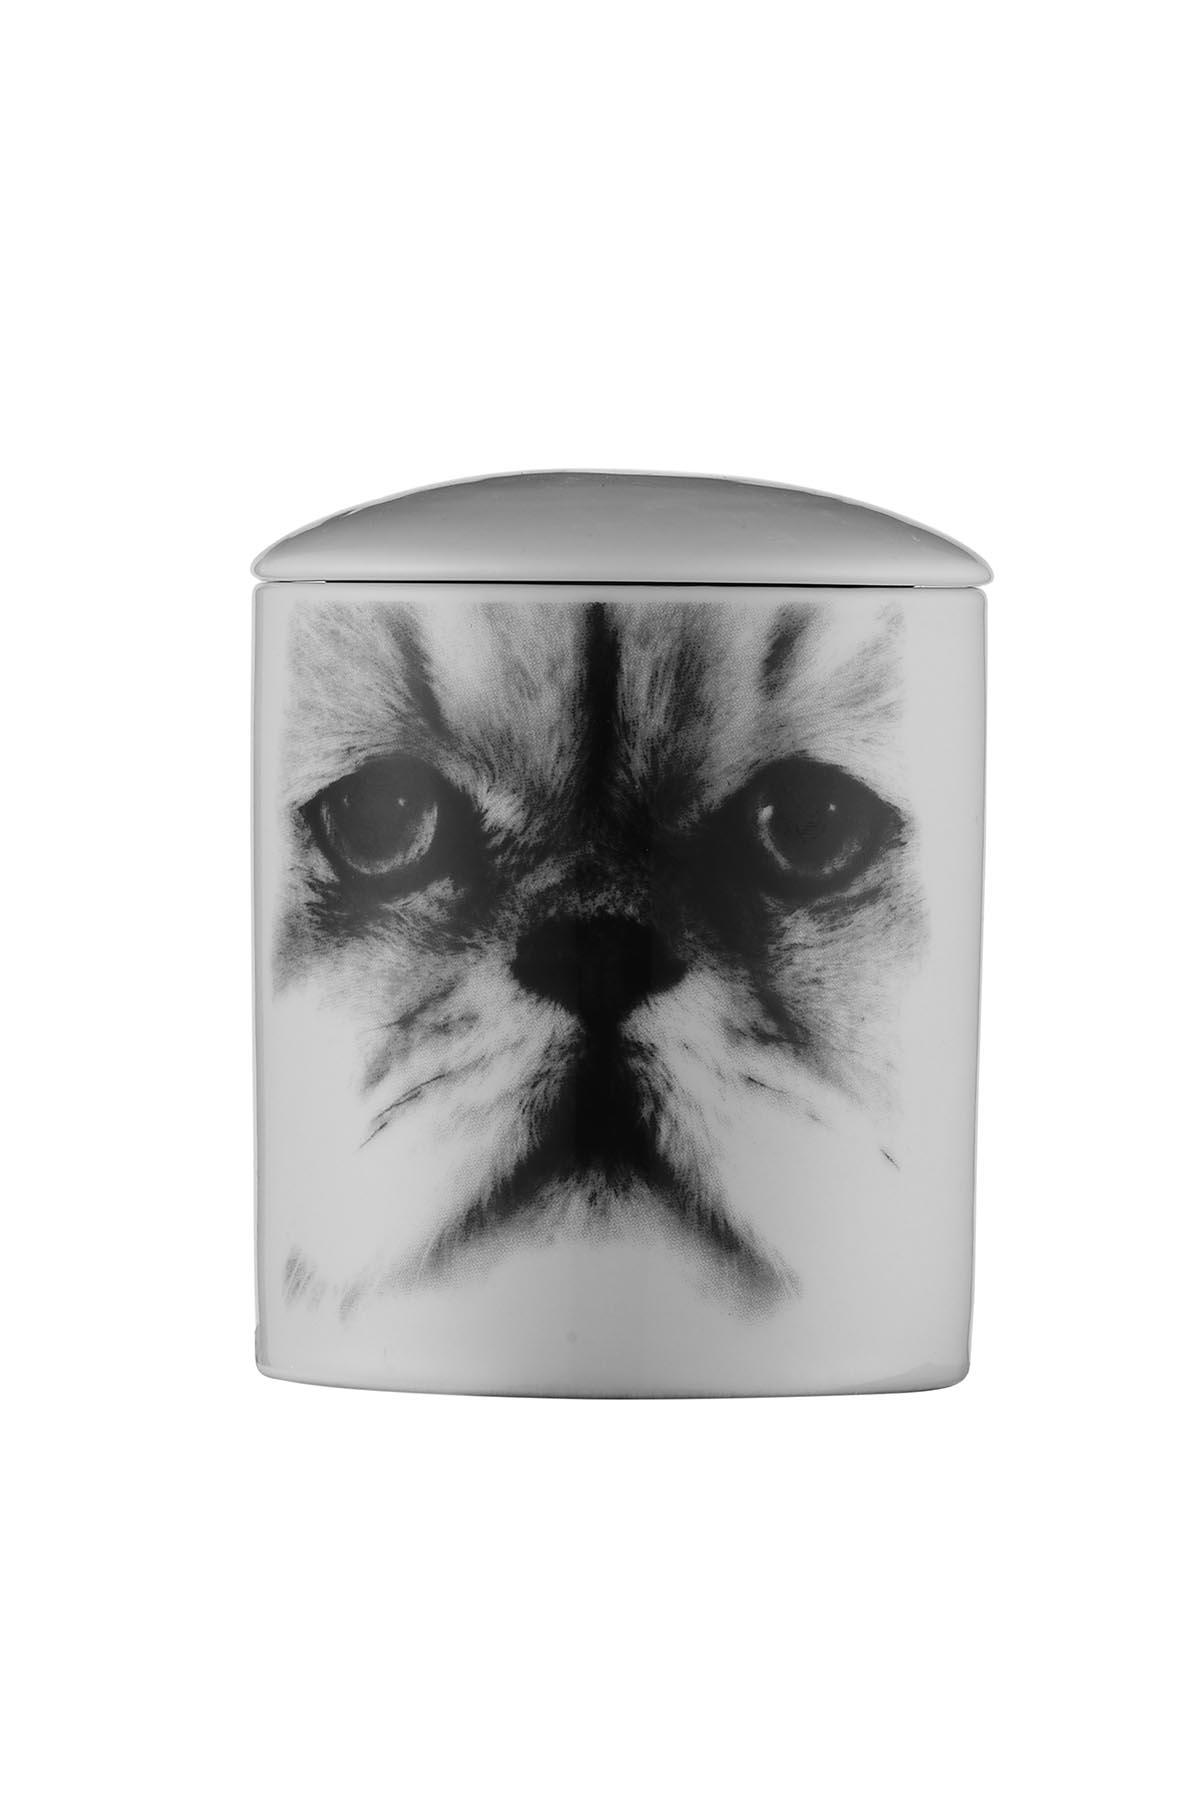 Kütahya Porselen - Kütahya Porselen Bardak Mum Kedi Desen